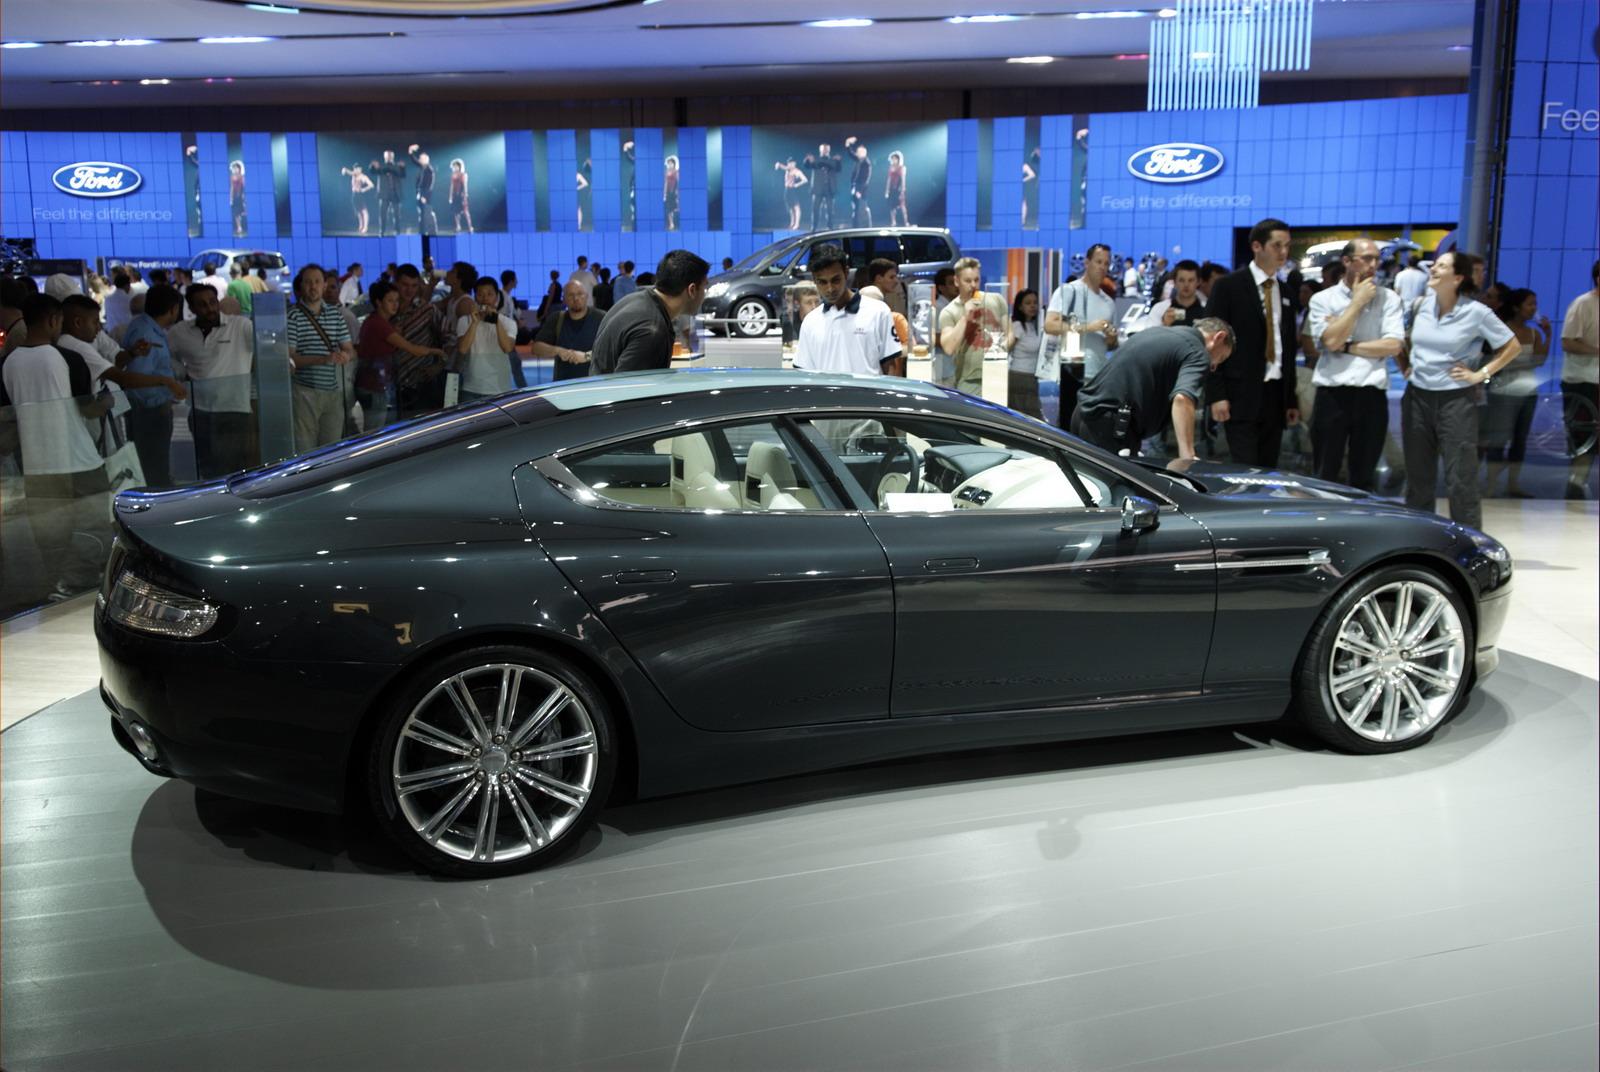 File:Aston Martin Rapide concept - 11 - Flickr - inkiboo ... | aston martin rapide concept